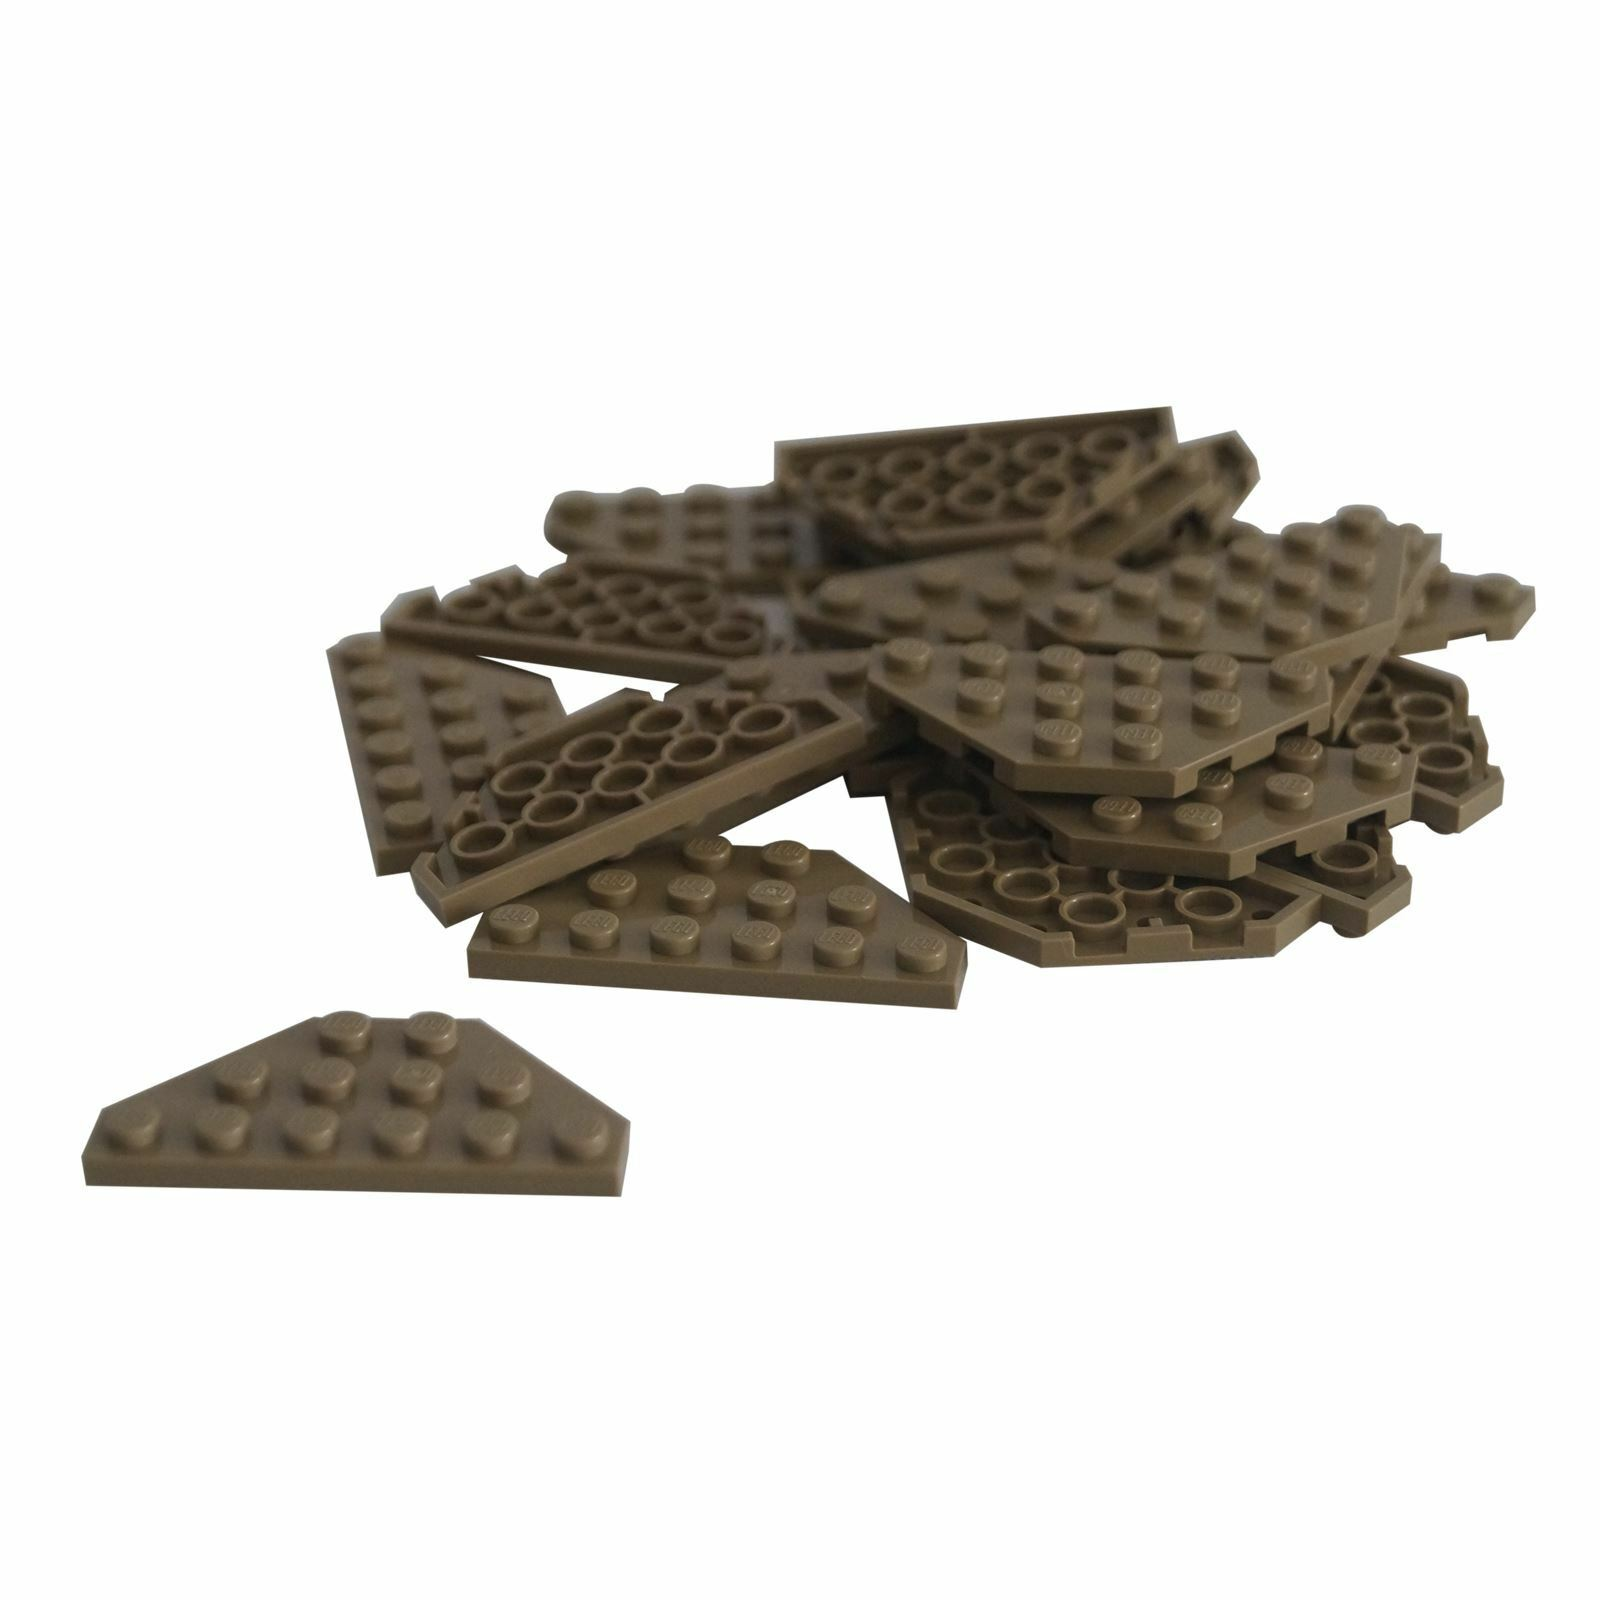 4x Lego 2419 Diagonal eckplatte Wing Corner Wedge Plate 3x6 Green Green New